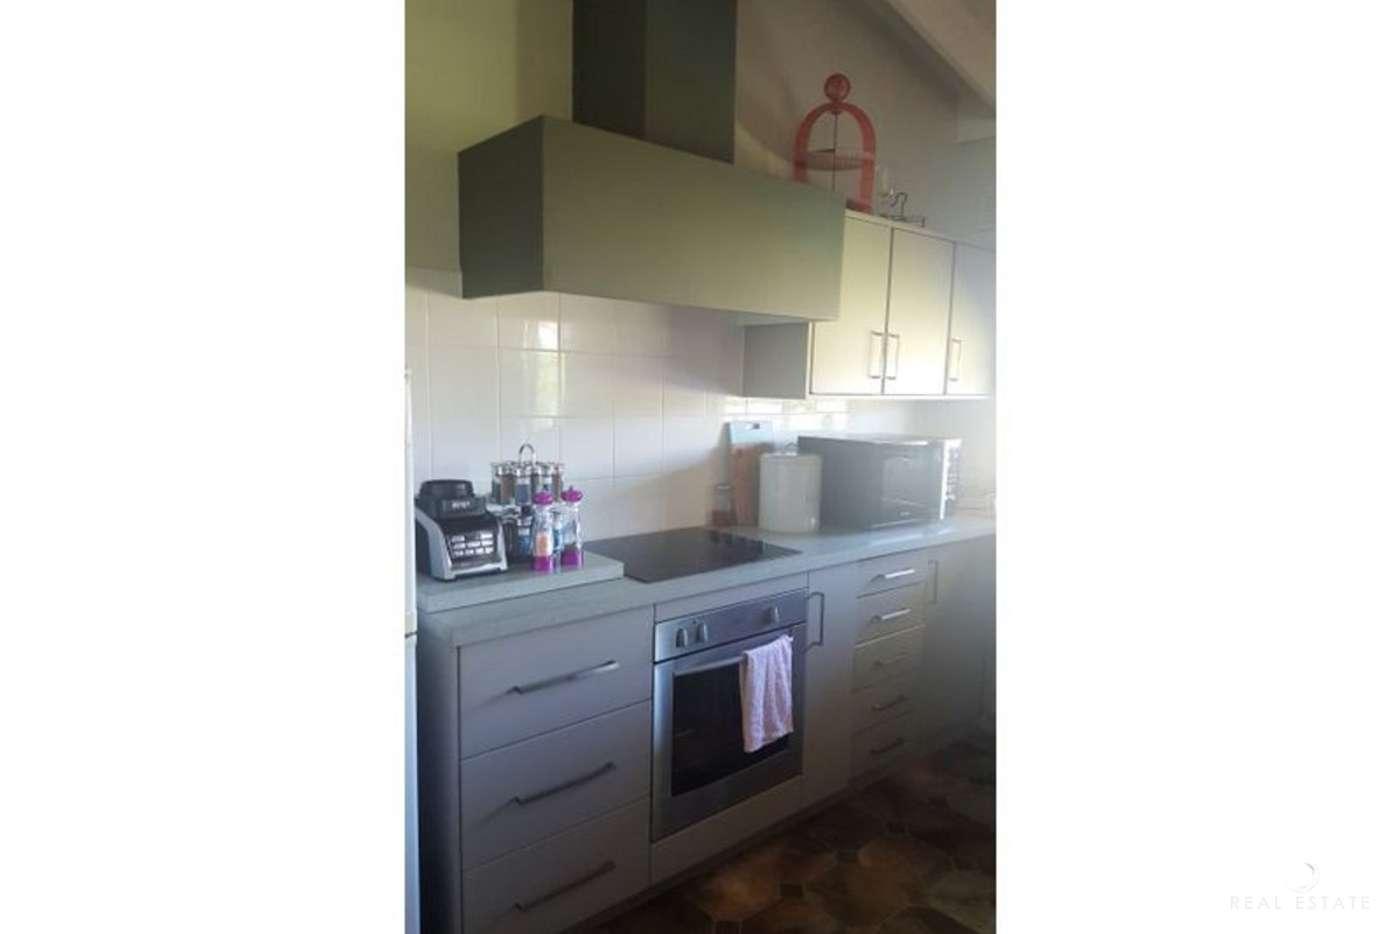 Main view of Homely house listing, 50 Kurrajong Street, Mount Gambier SA 5290